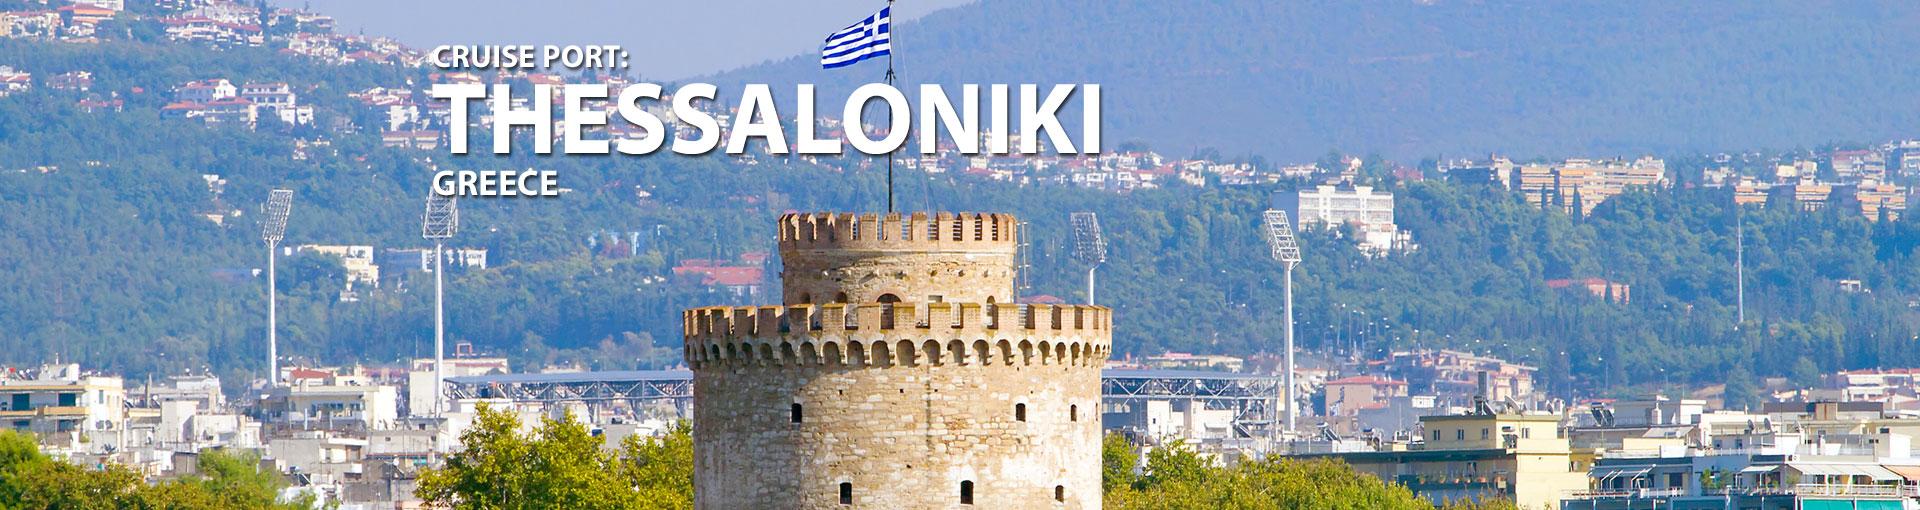 Cruises to Thessaloniki, Greece